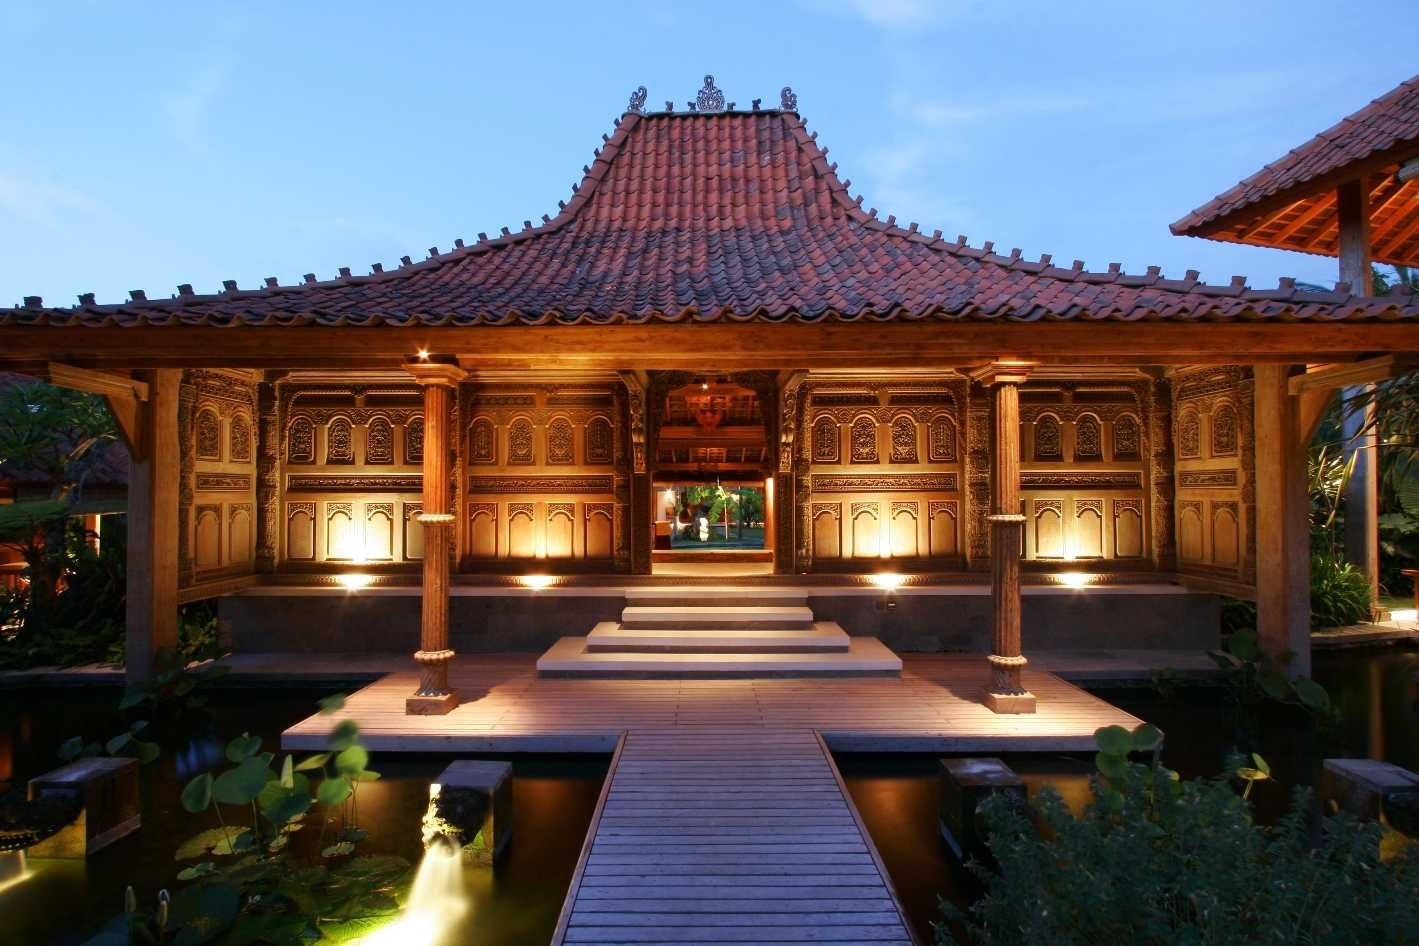 Rumah Adat Joglo Rumah Adat Di Jawa Tengah Yang Sudah Berpindah